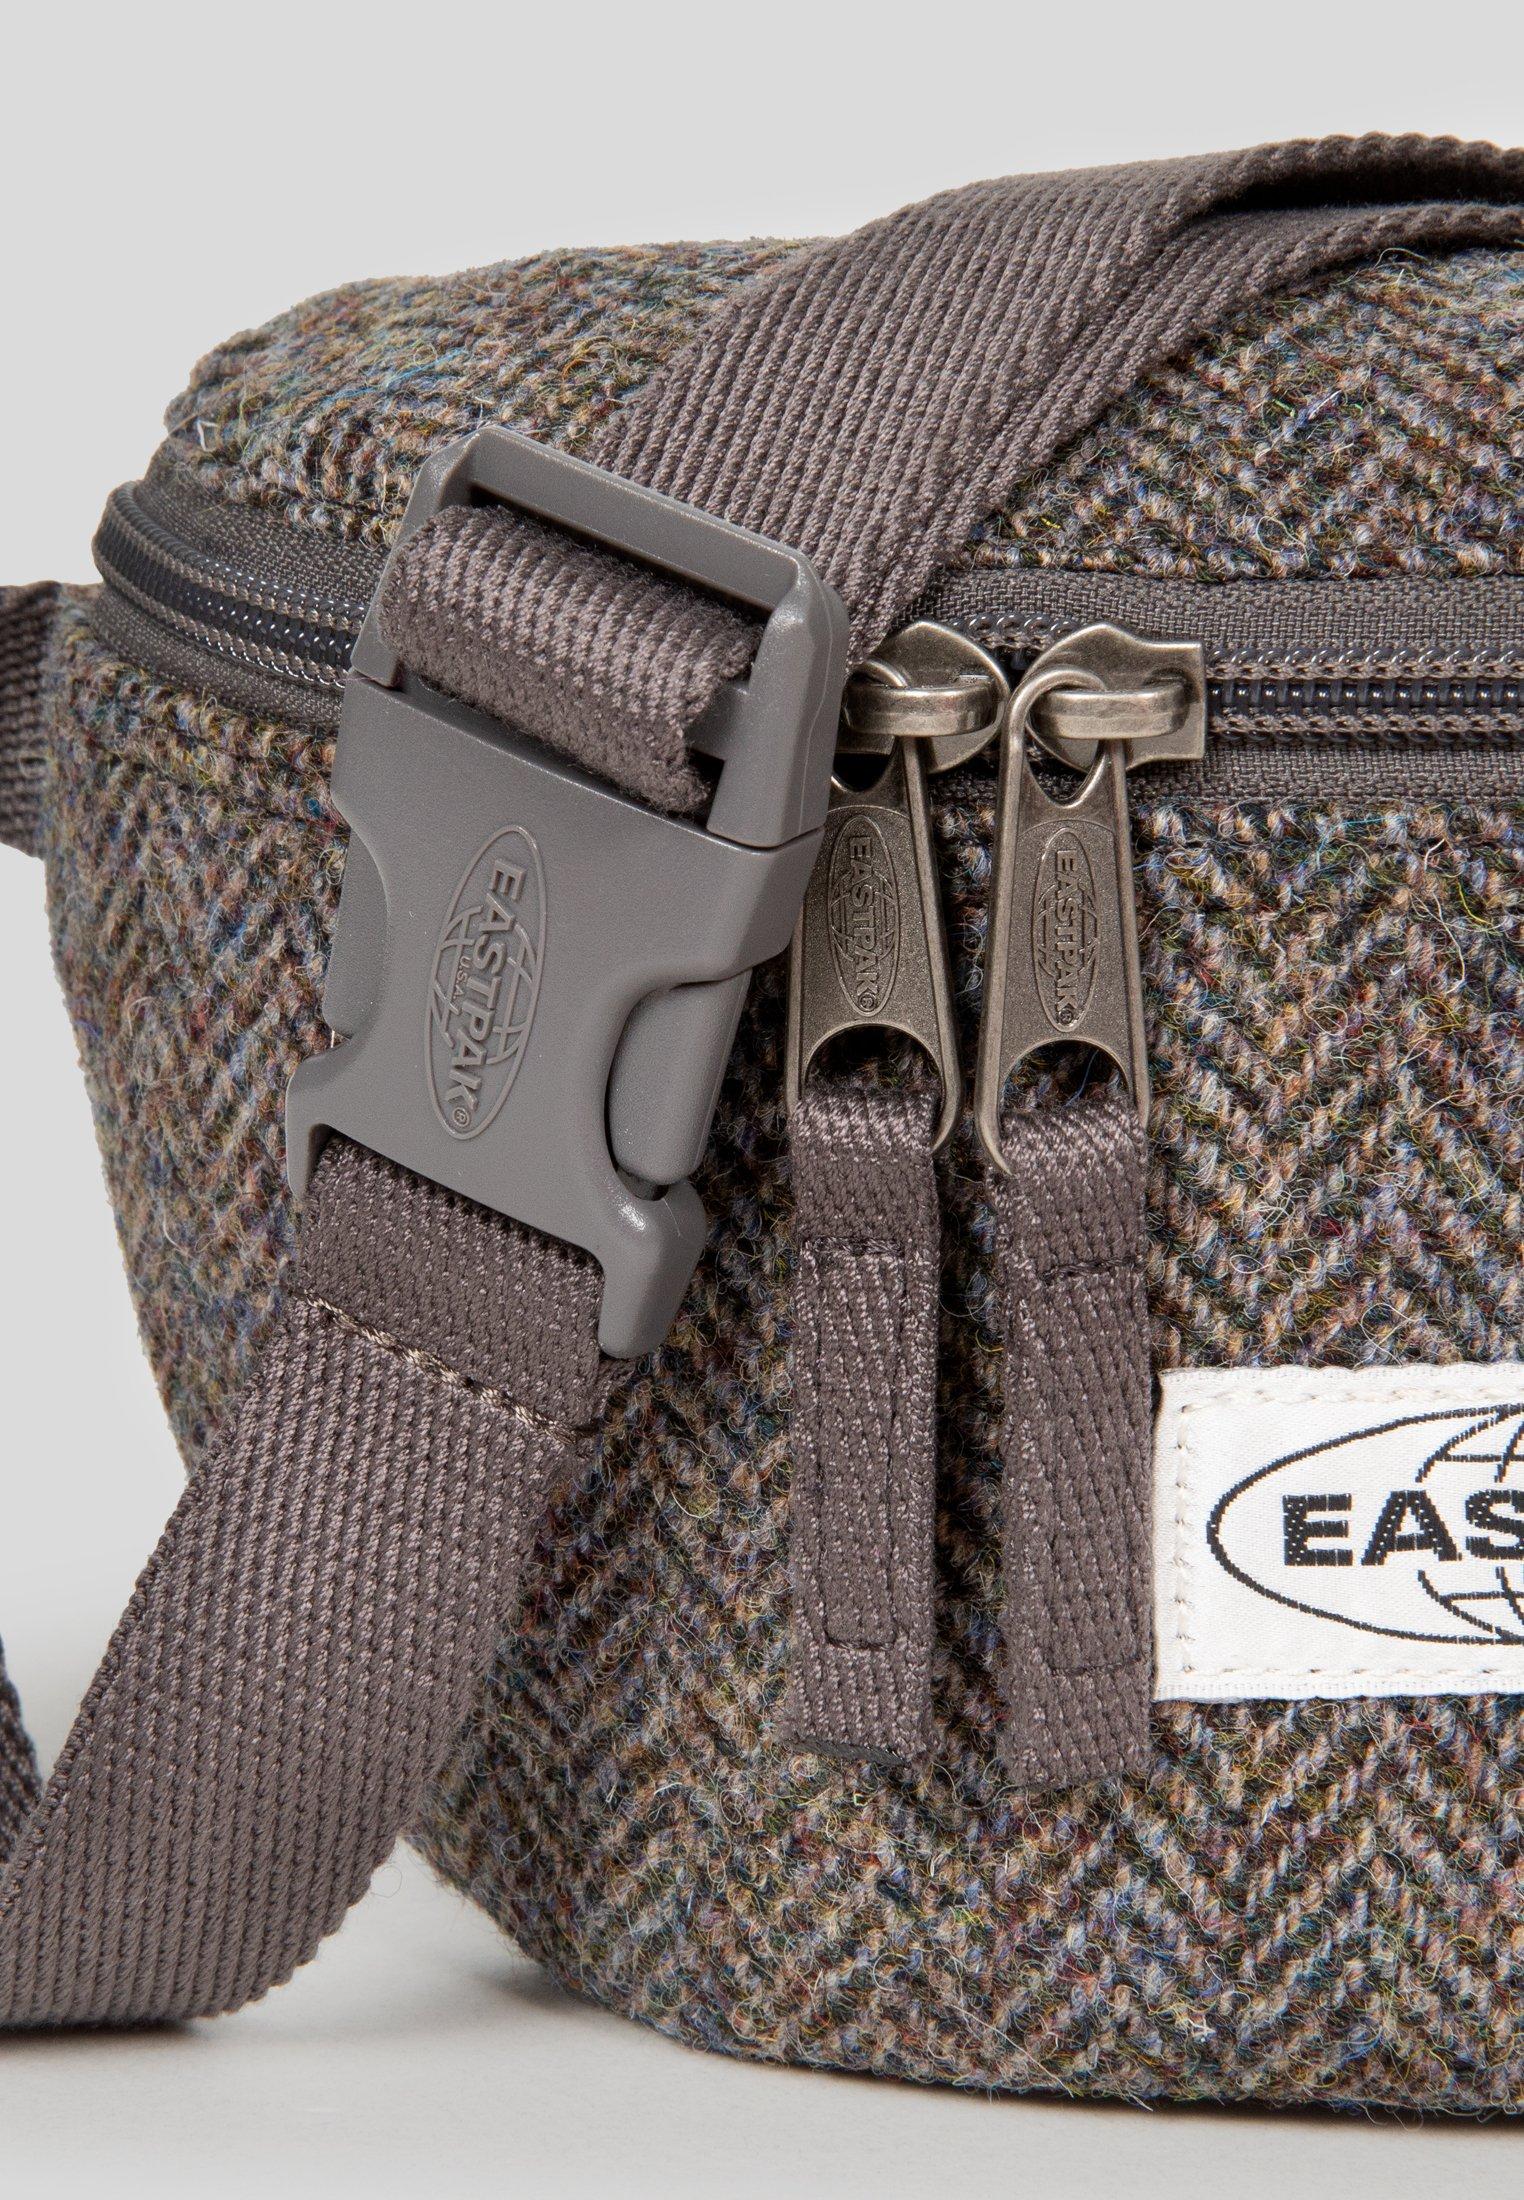 Eastpak Heuptas - Brown kBoZNv3